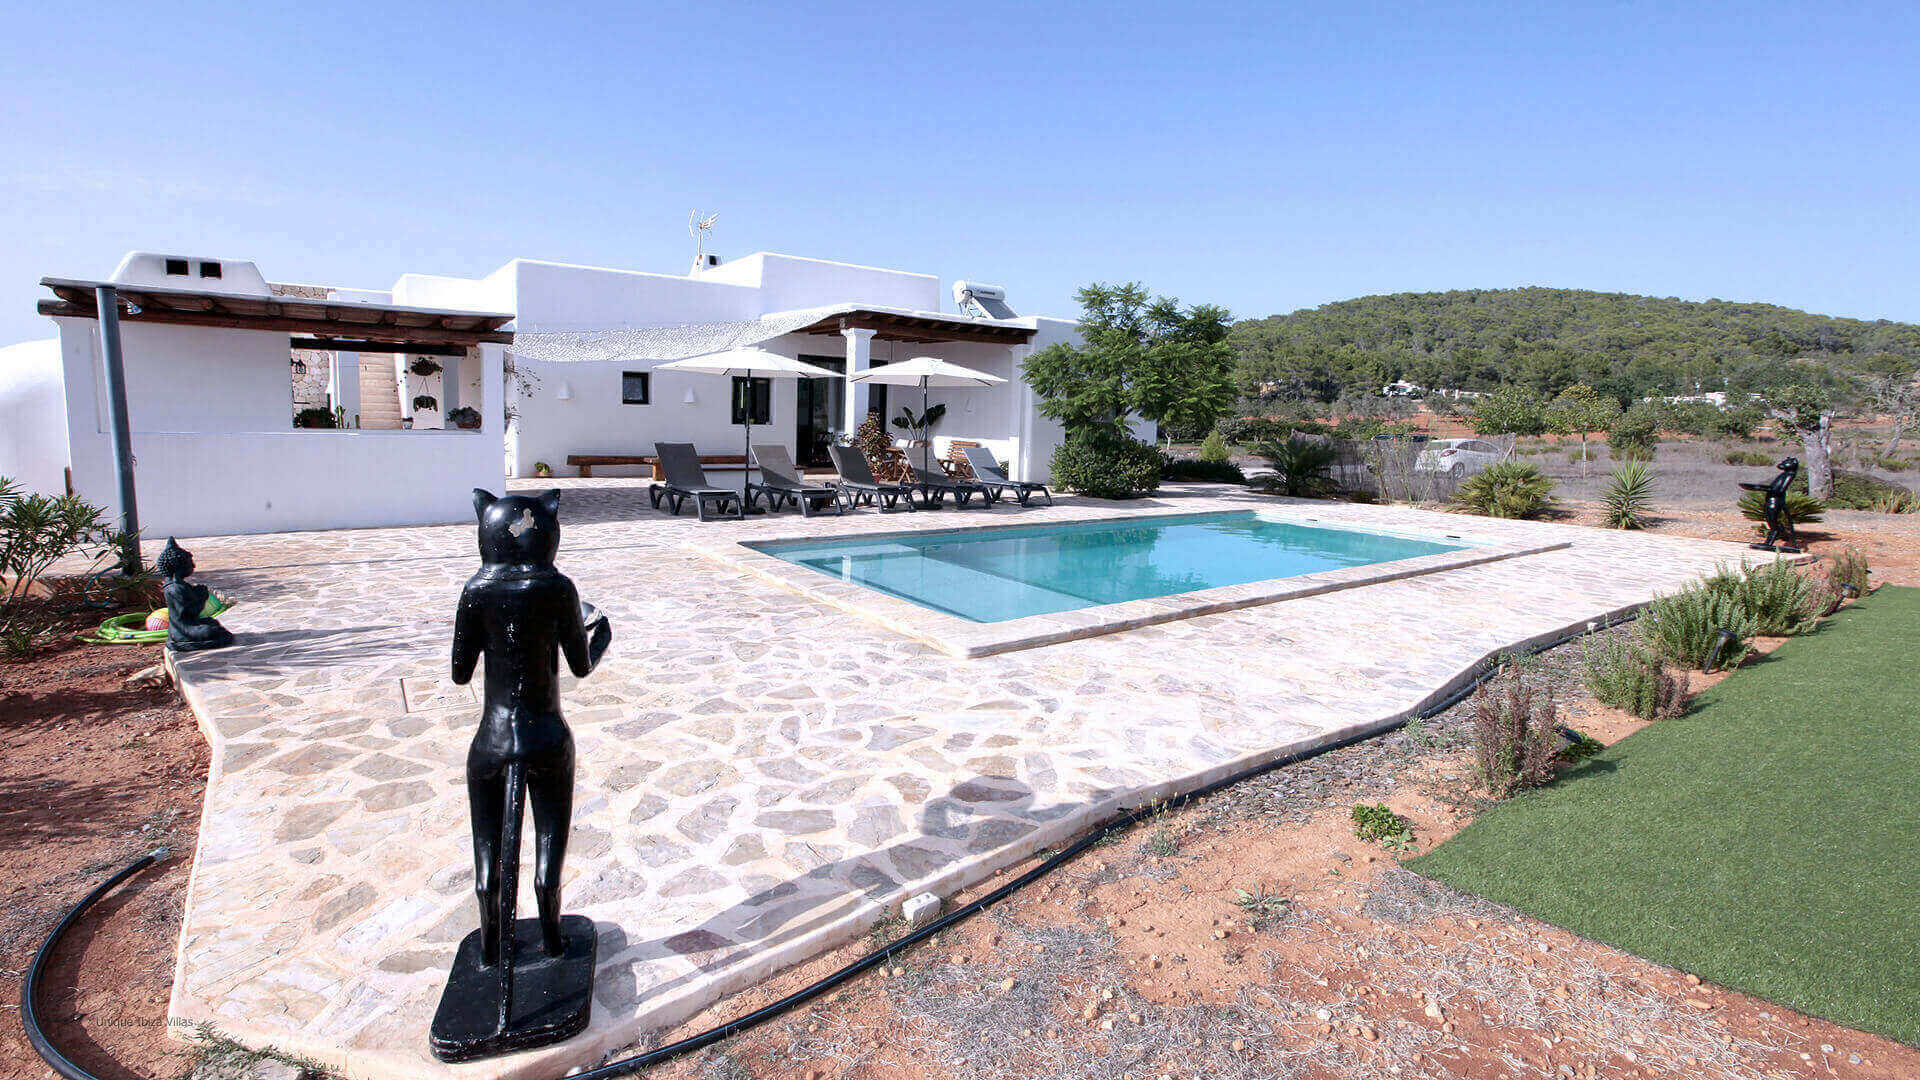 Cana Marieta Ibiza Villa 2 Near San Miguel